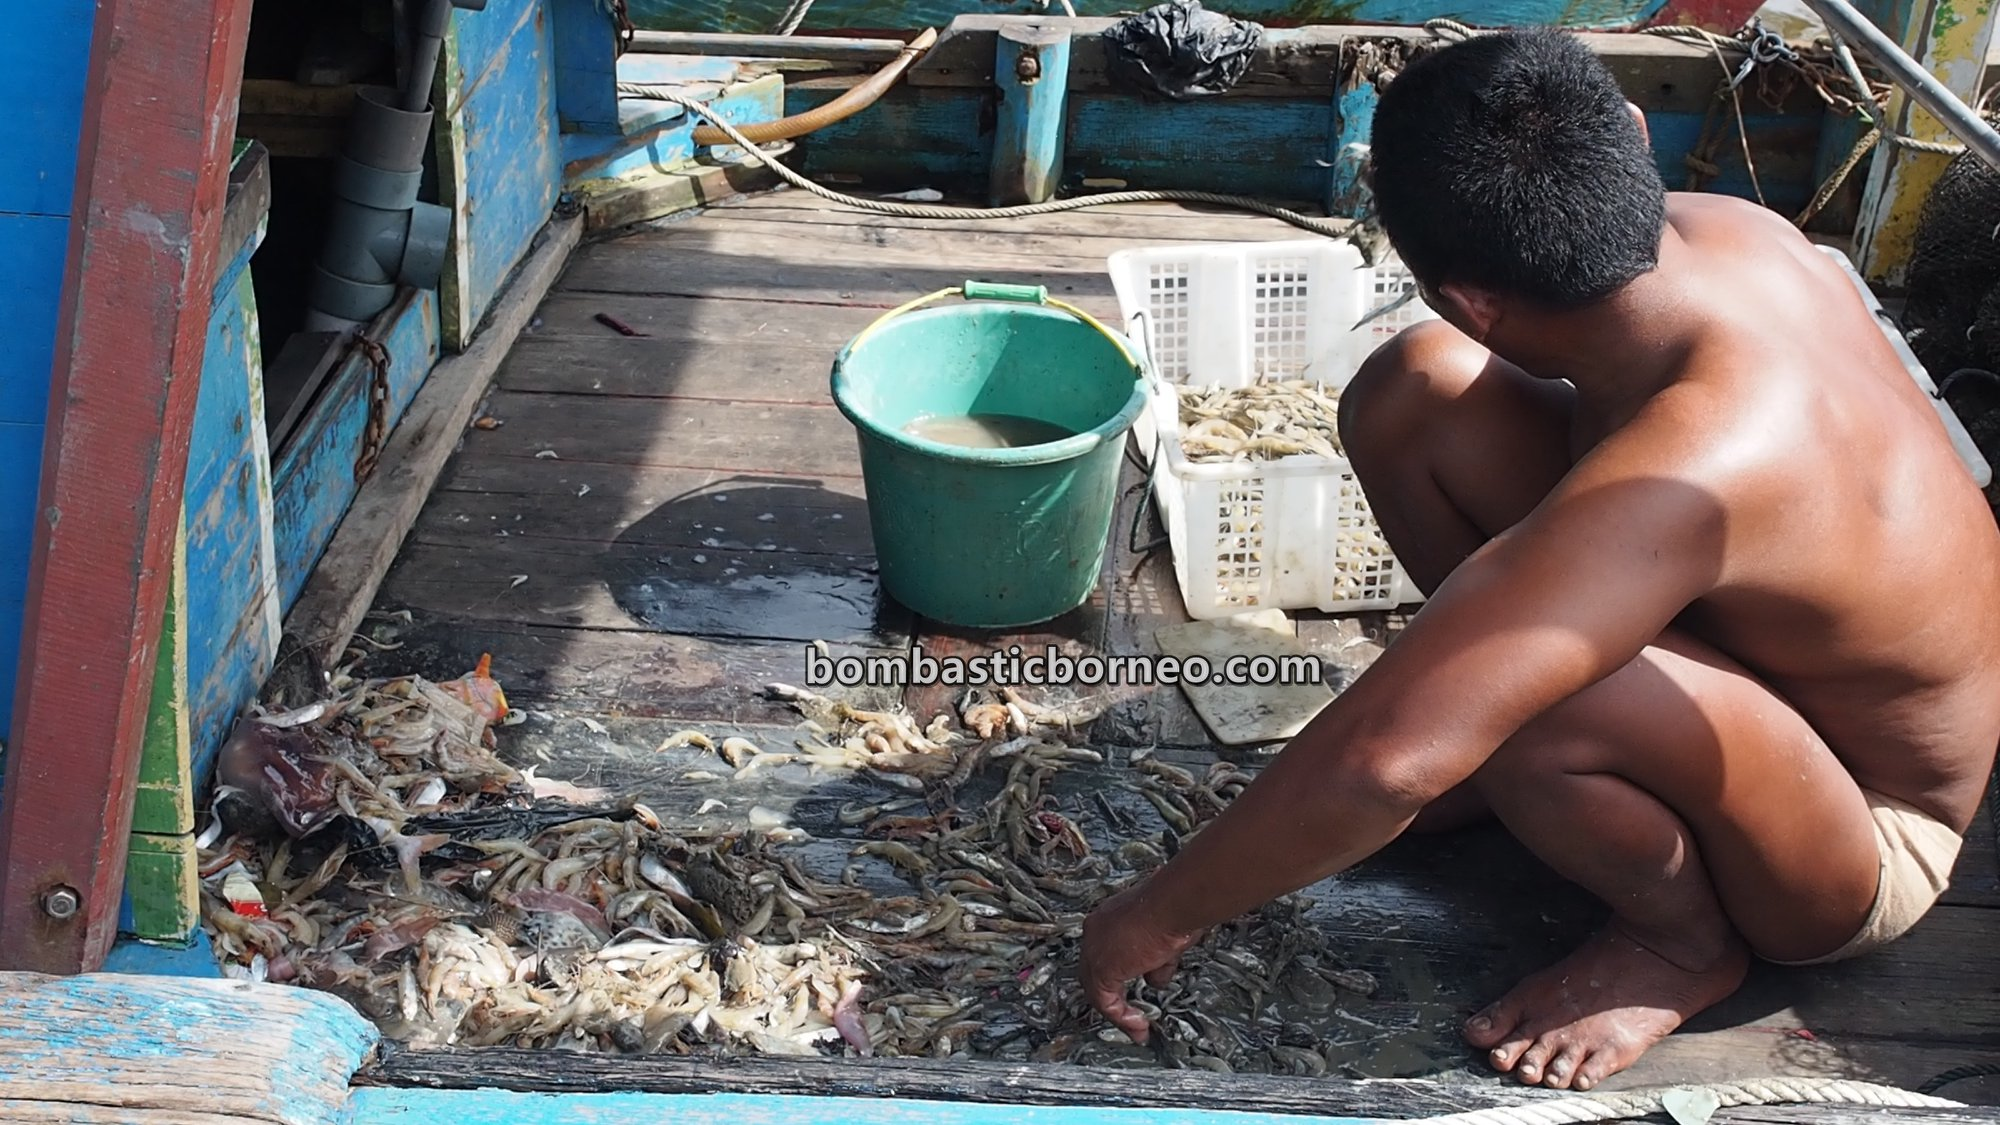 Kampung Nelayan Melayu, authentic, traditional, destination, Kalimantan Barat, Kelurahan Kuala, seafood, travel guide, Trans Border, 探索婆罗洲游踪, 印尼西加里曼丹, 山口洋马来渔村